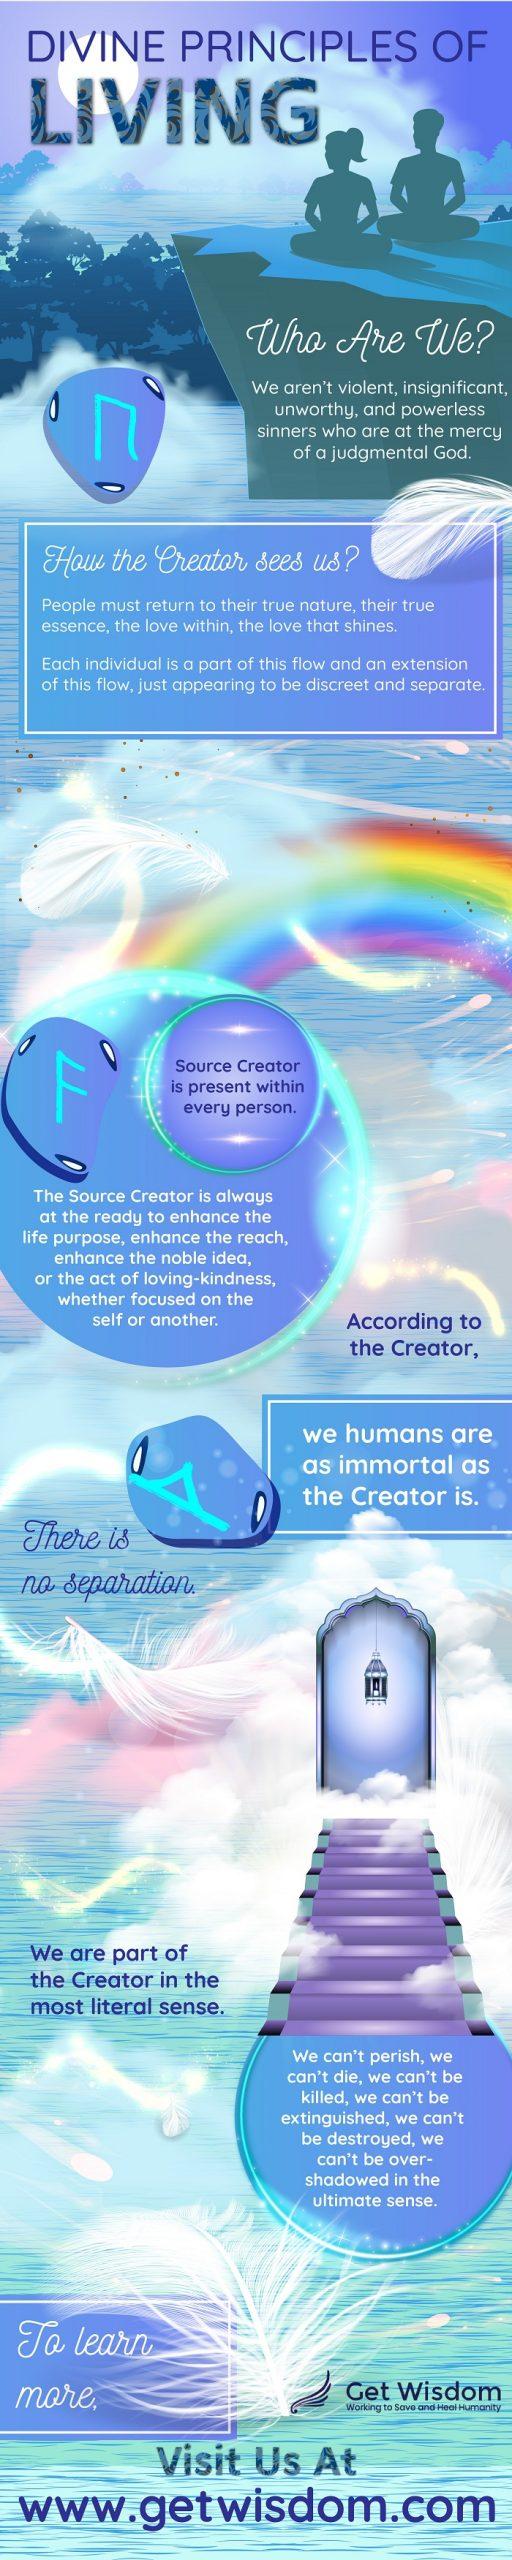 Divine Principles of Living